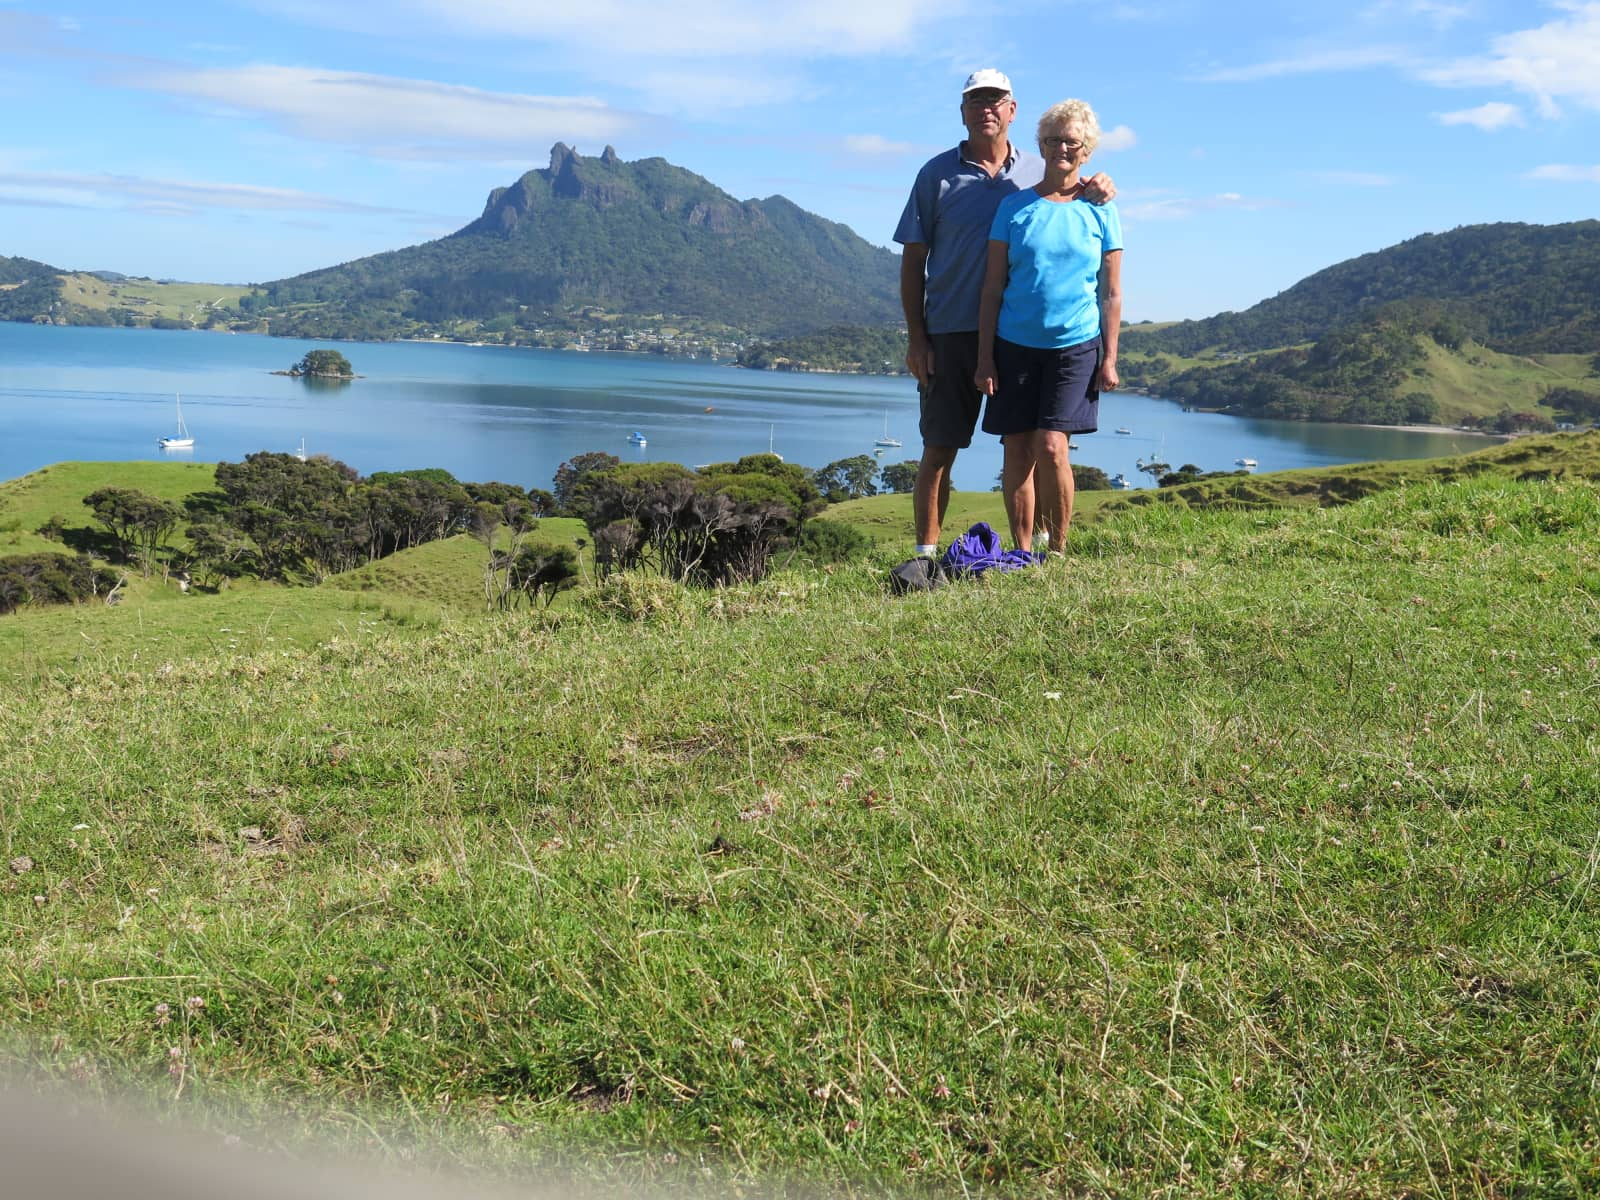 Bonnie & Harvey from Whangarei Heads, New Zealand